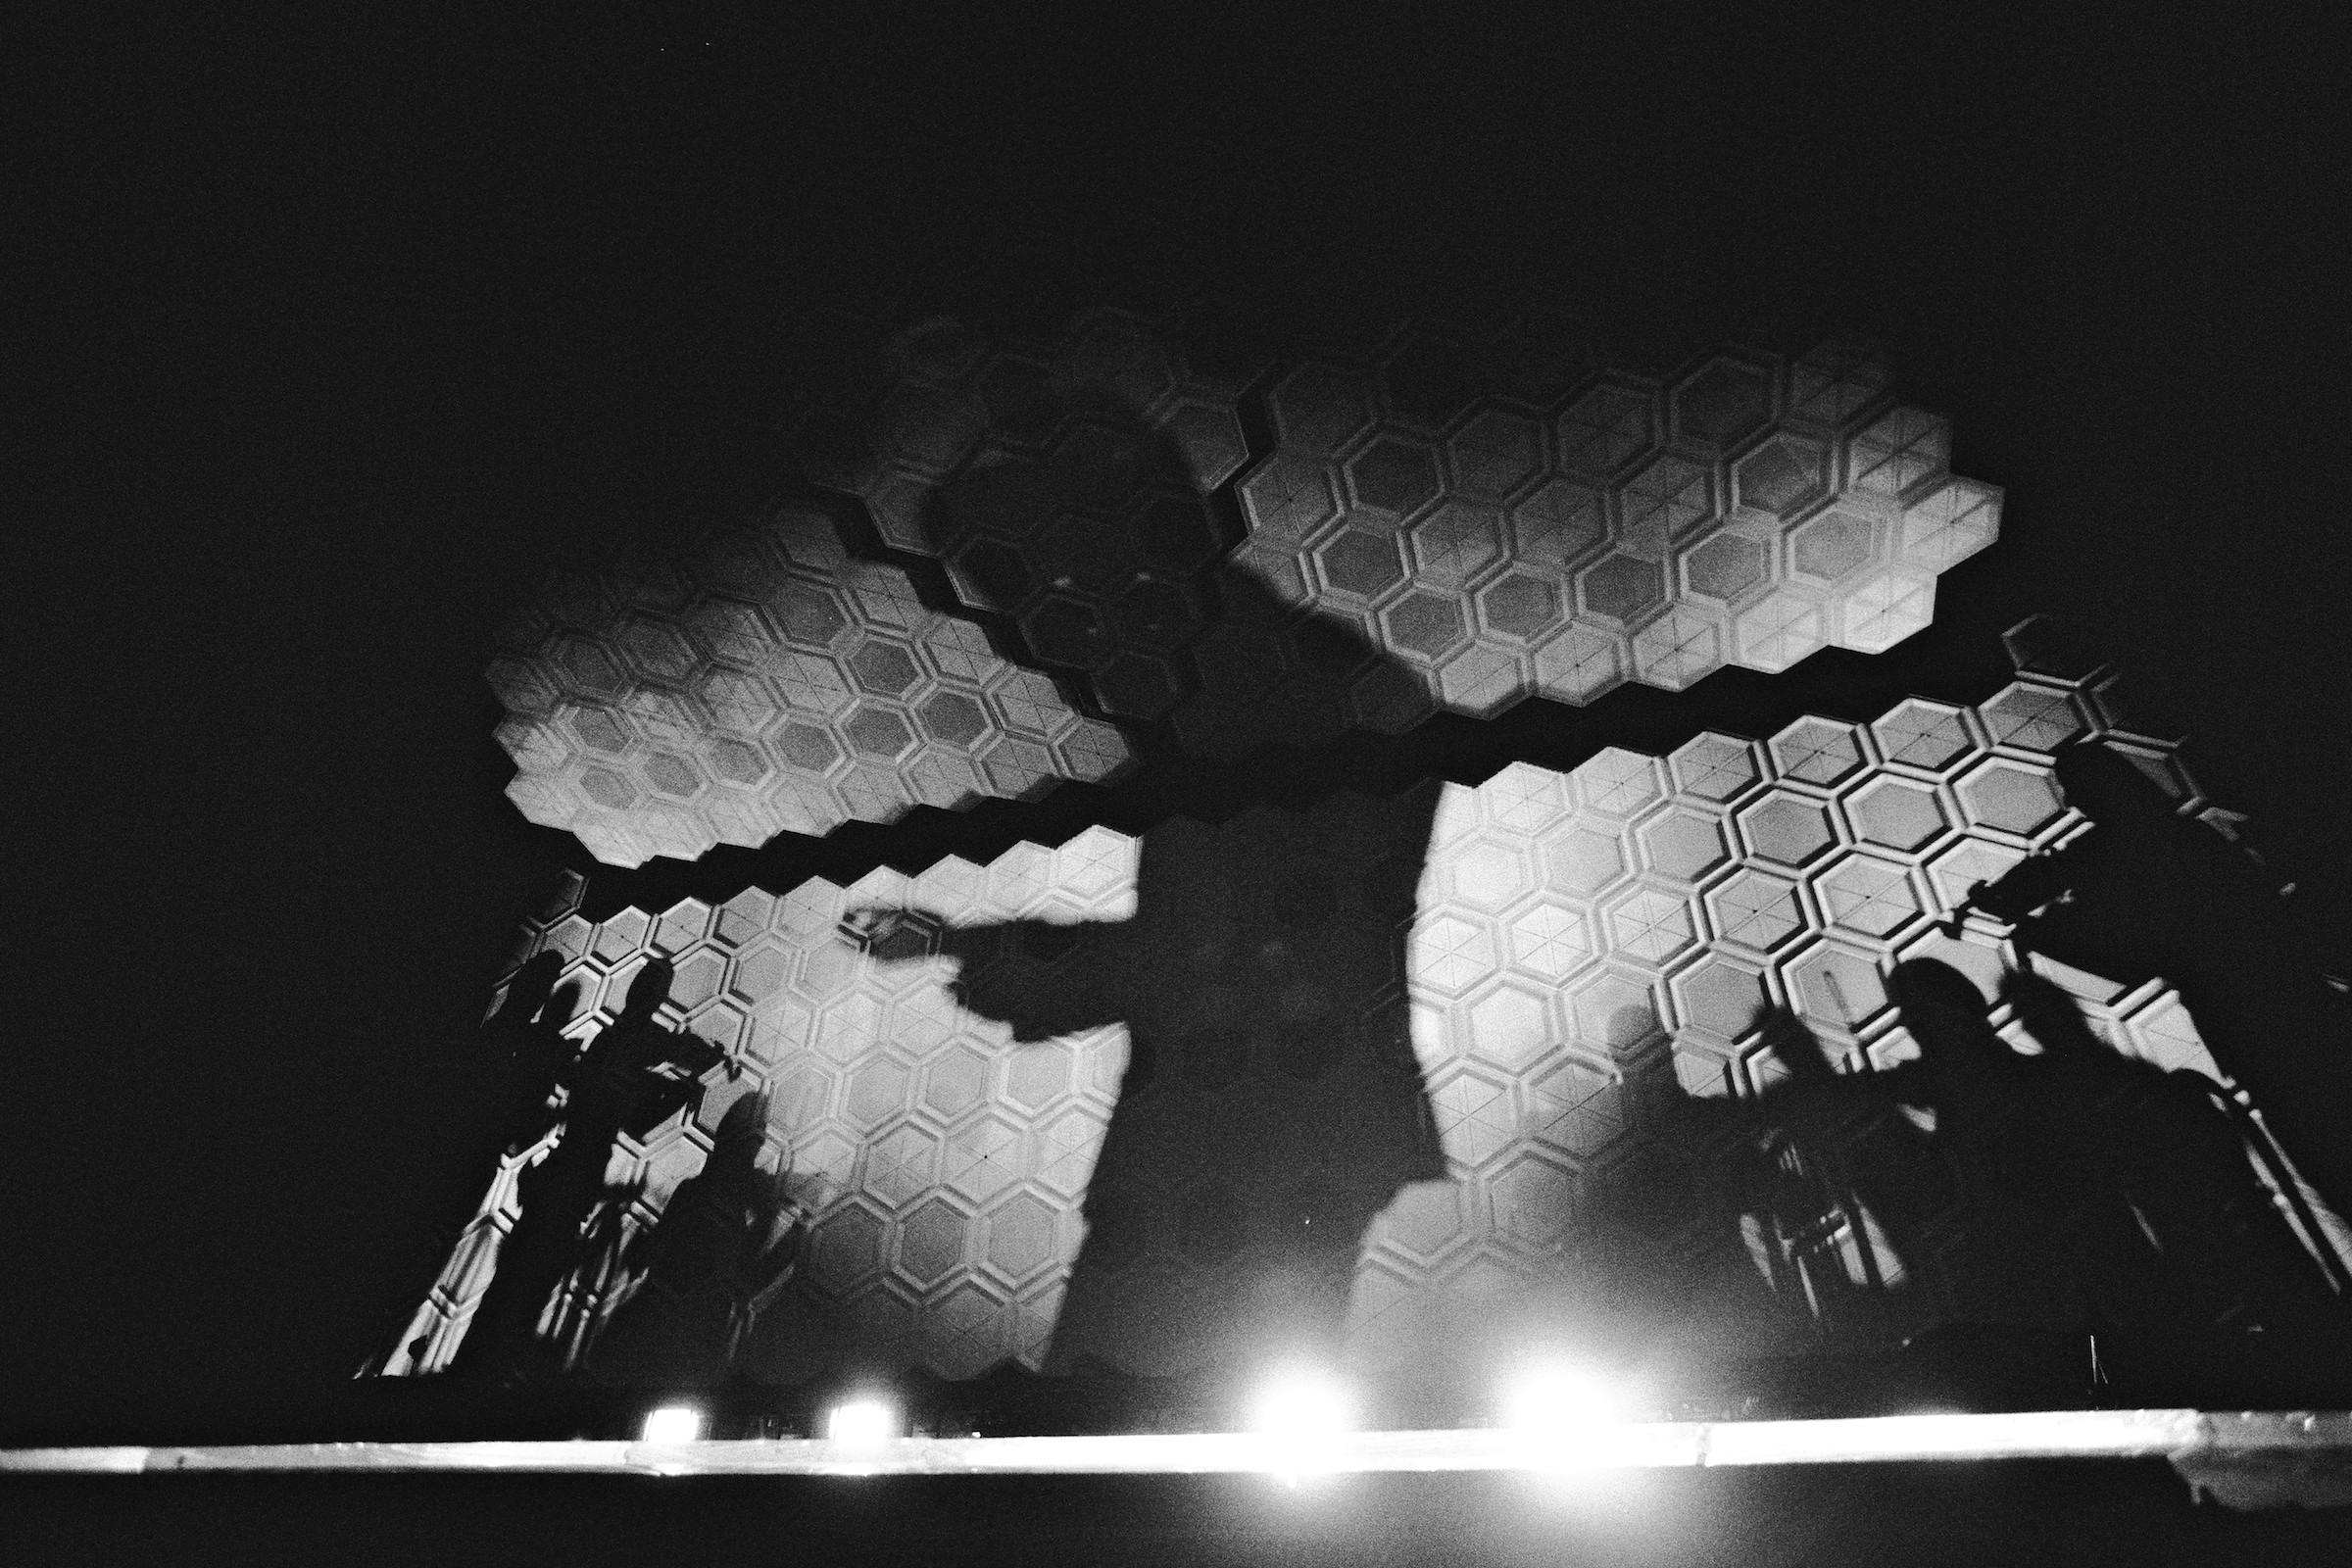 Justin Timberlake x The Tennessee Kids / JT2020Tour